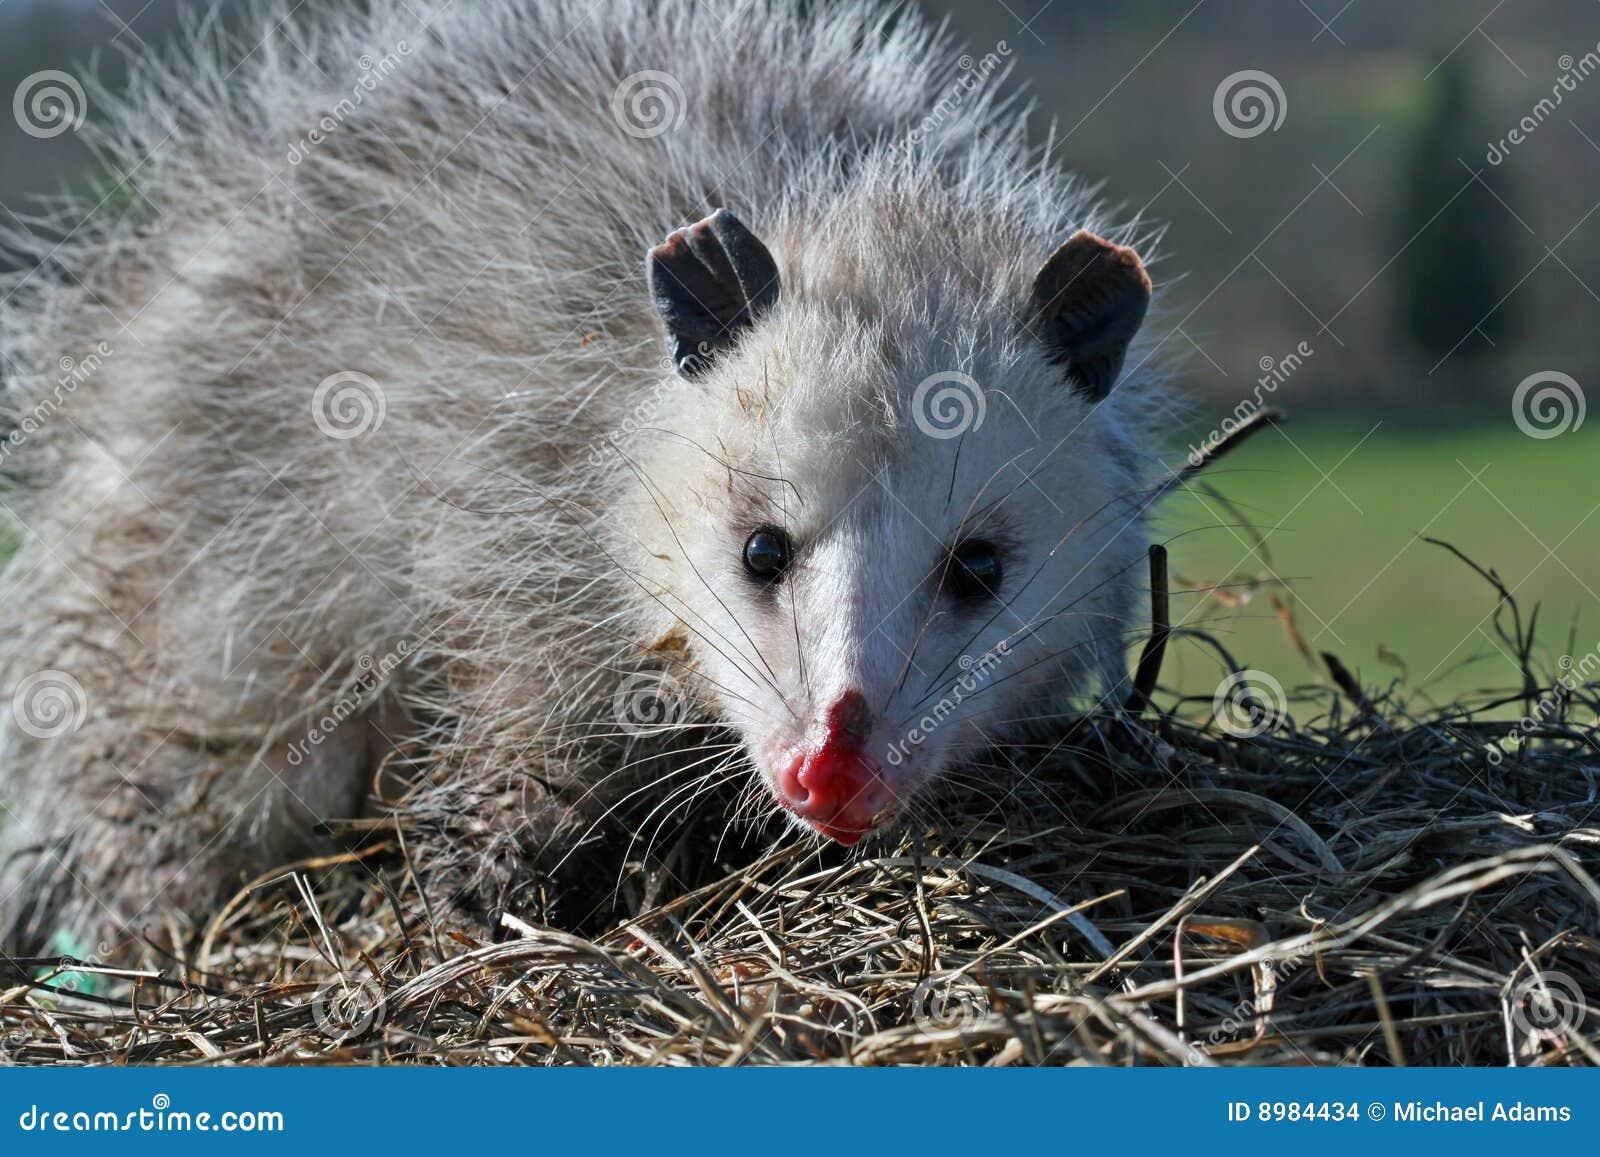 Opossum de la Virginie